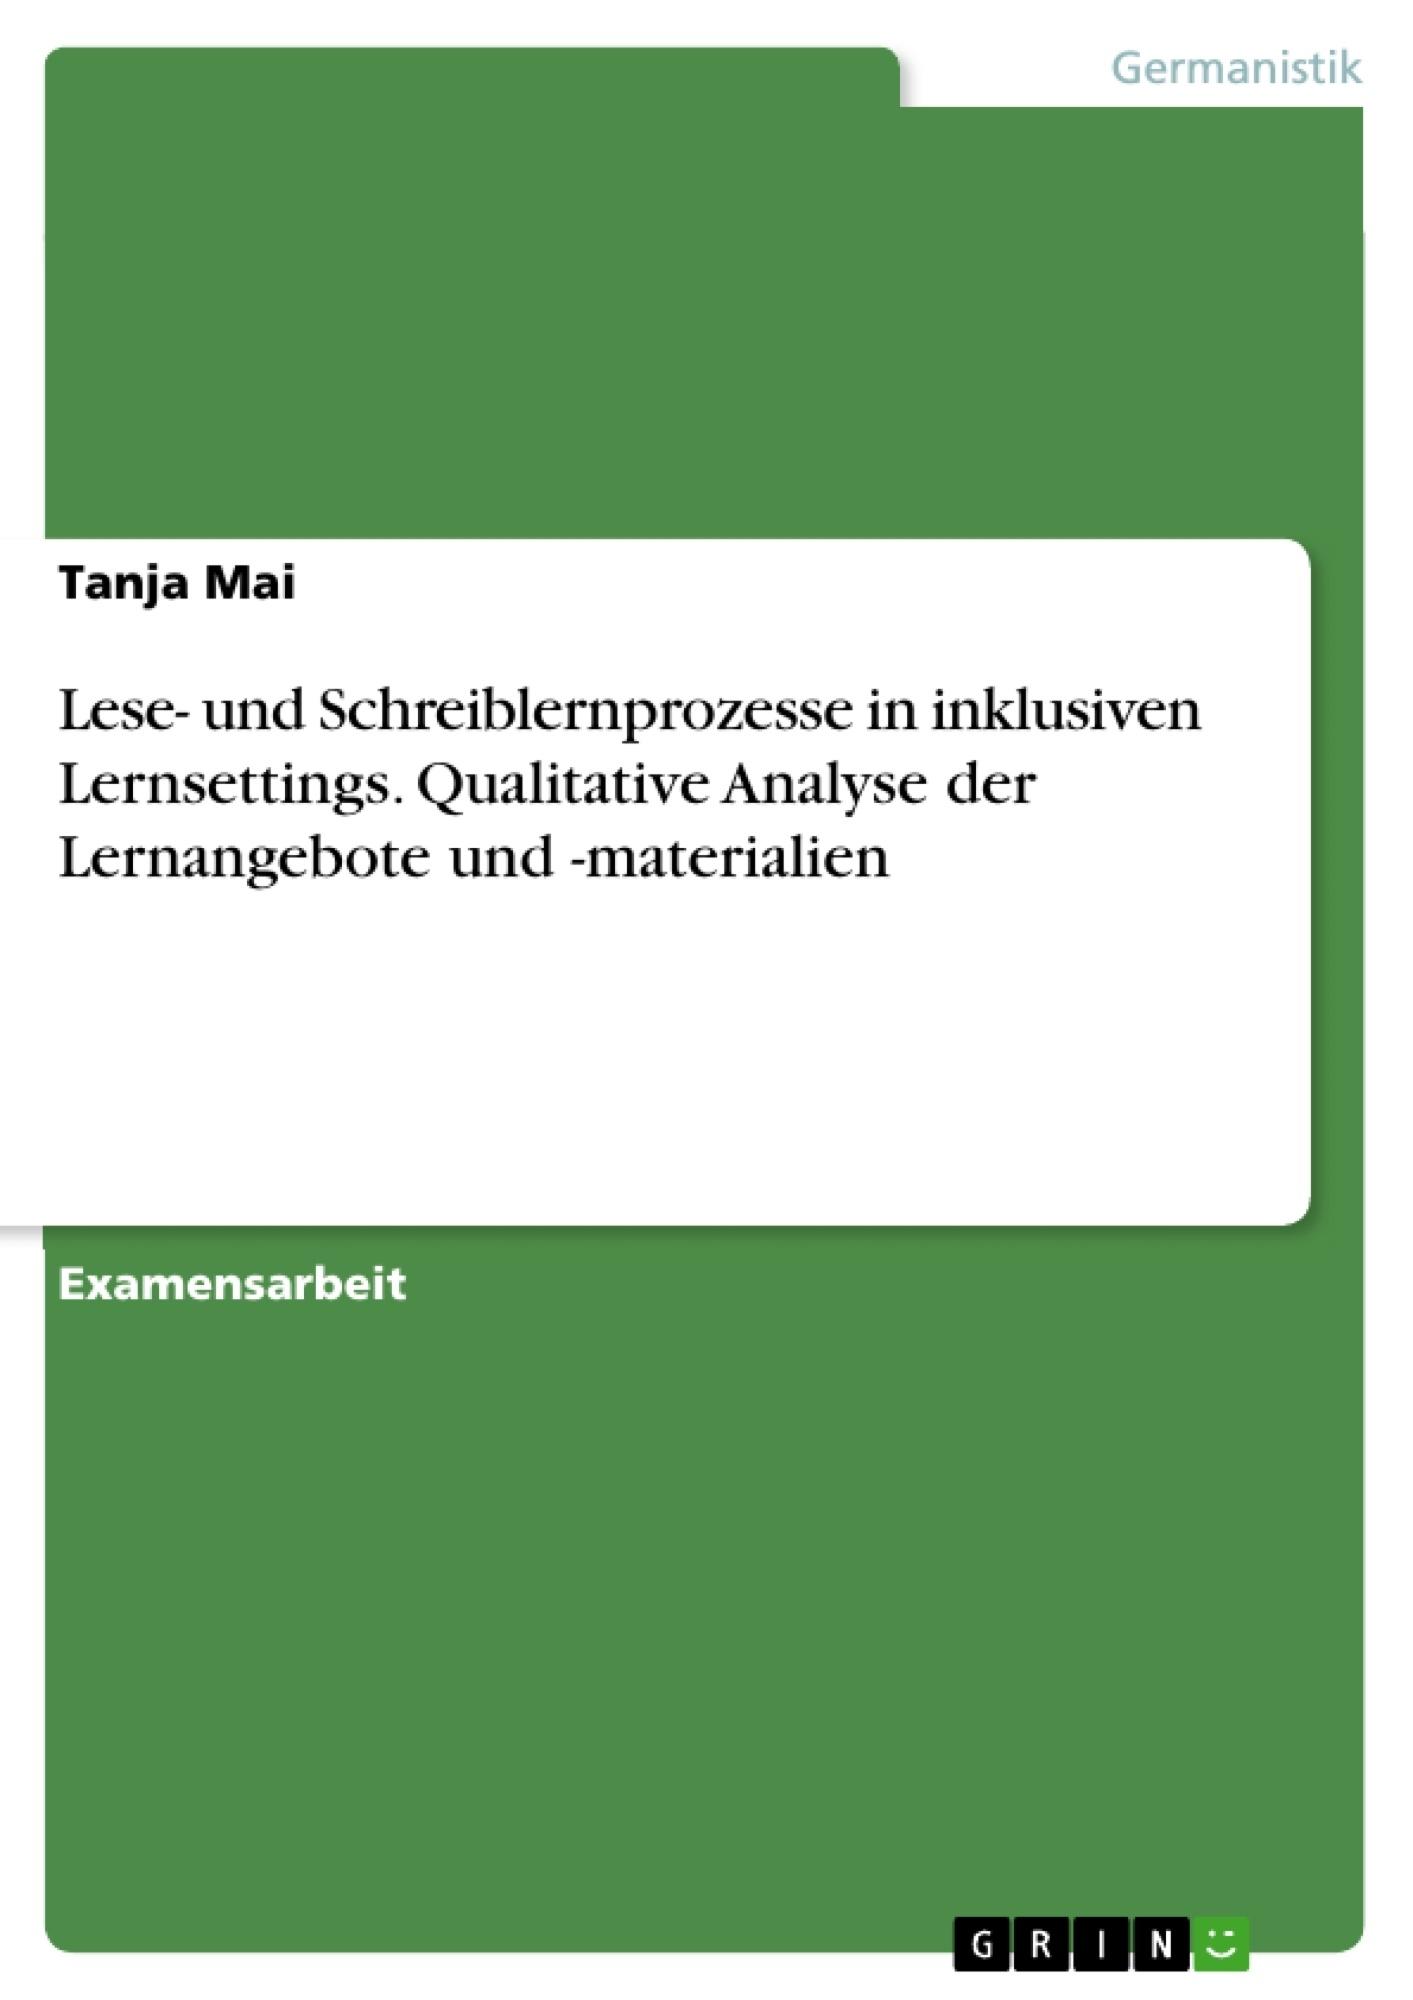 Lese- und Schreiblernprozesse in inklusiven Lernsettings ...